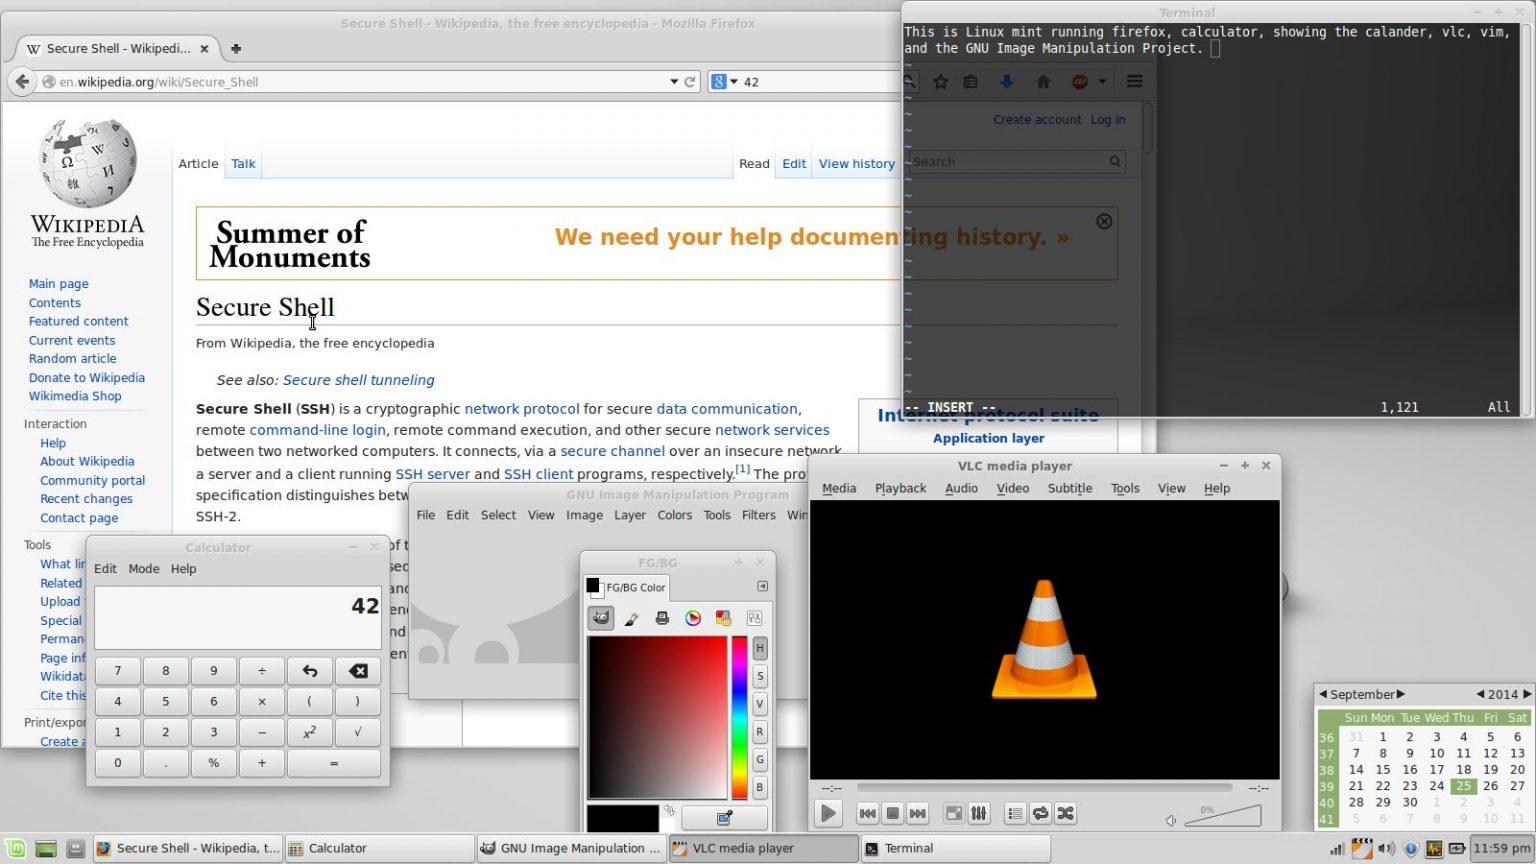 Exemples de logiciels libres Auteur: Benjamintf1 Source: Wikimedia Commons Licence: CC BY-SA 4.0